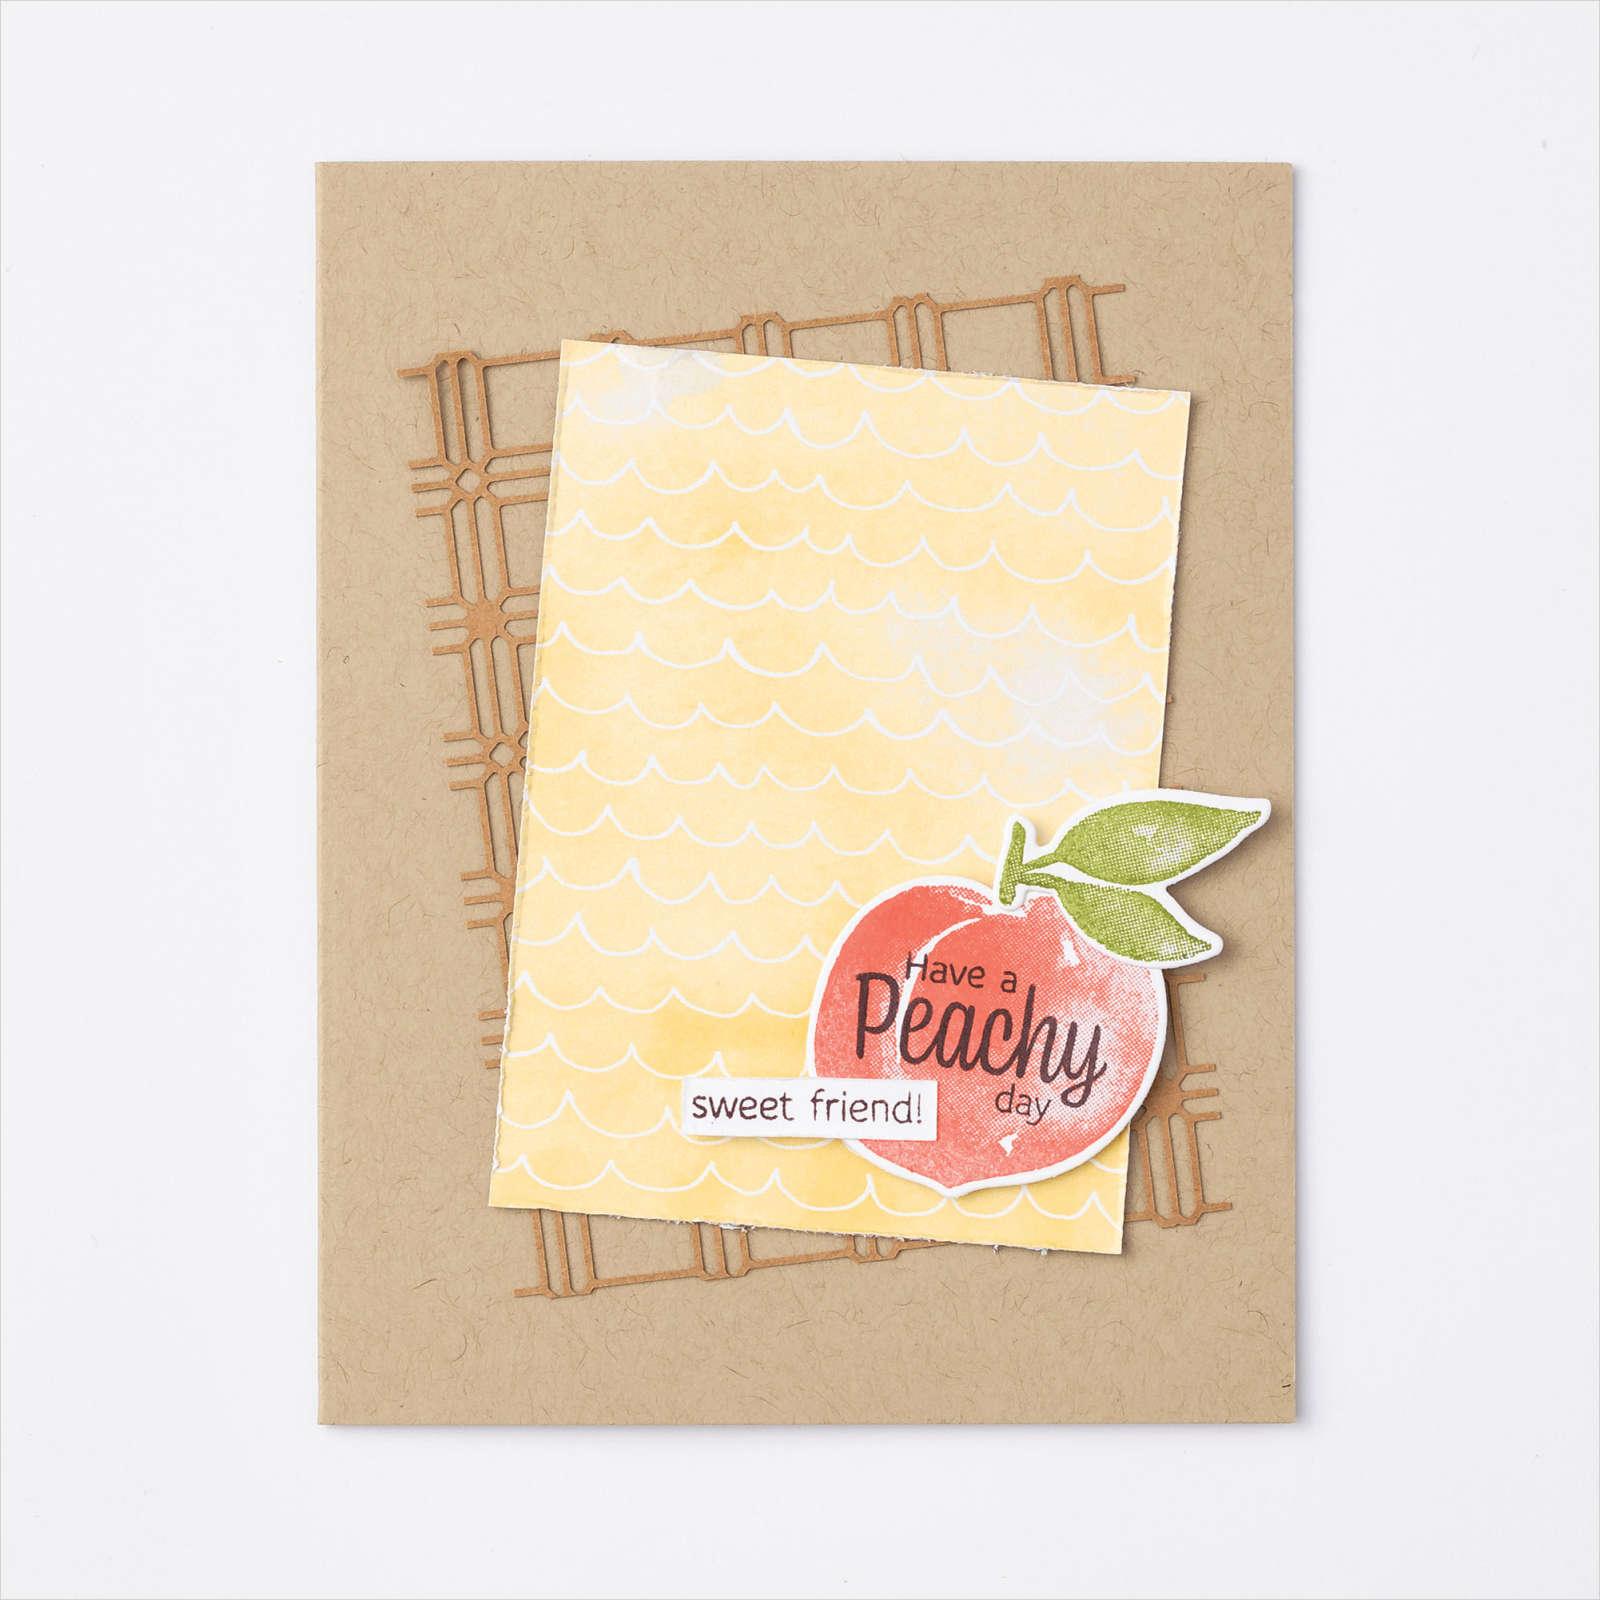 YOU'RE A PEACH SUITE - Peachy Day Card